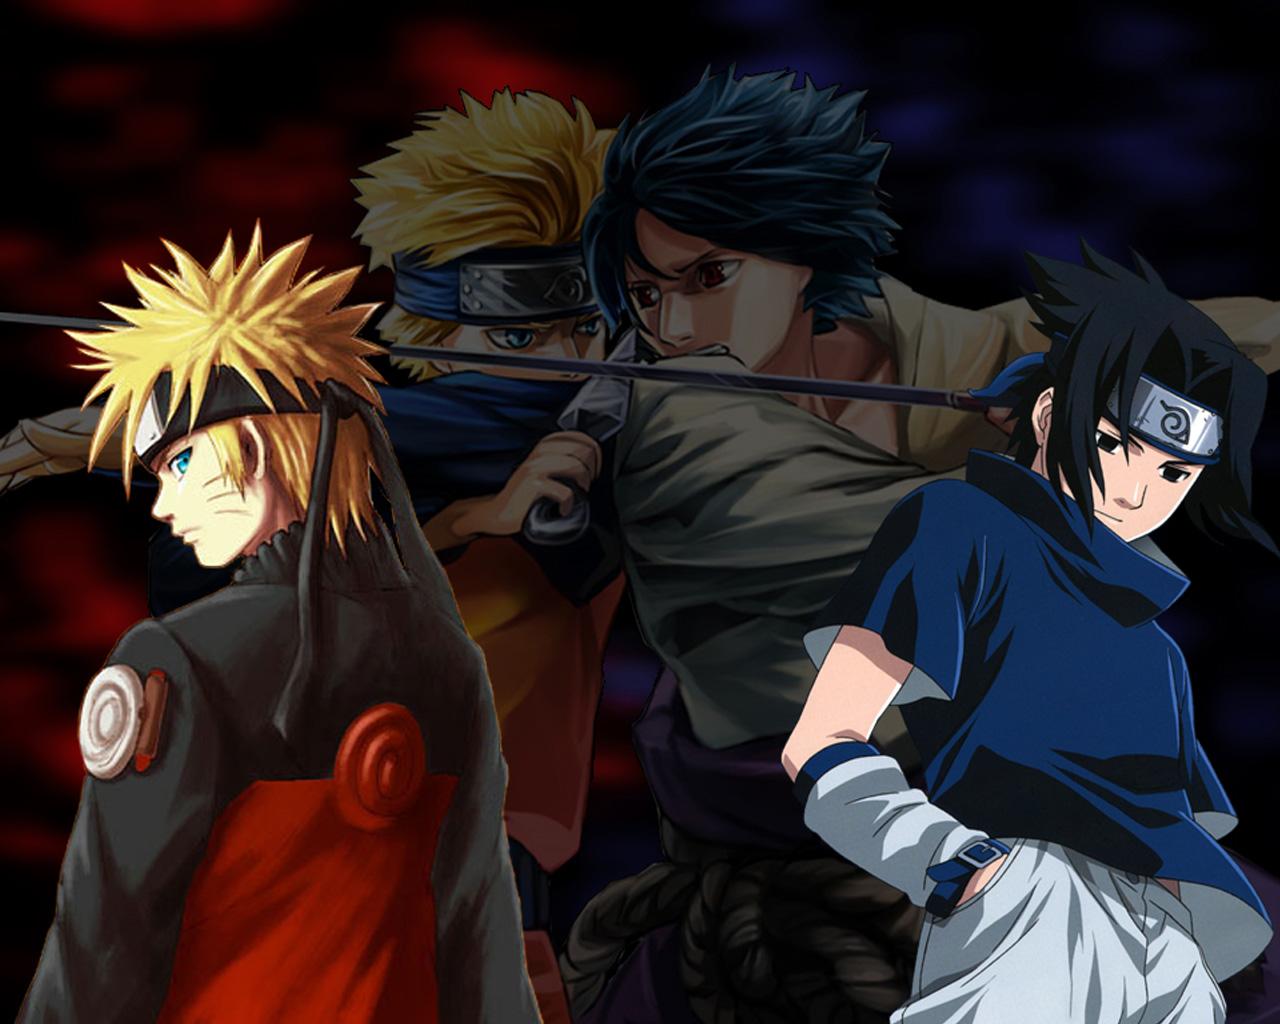 Gallery For gt Sasuke Vs Naruto Wallpaper 1280x1024